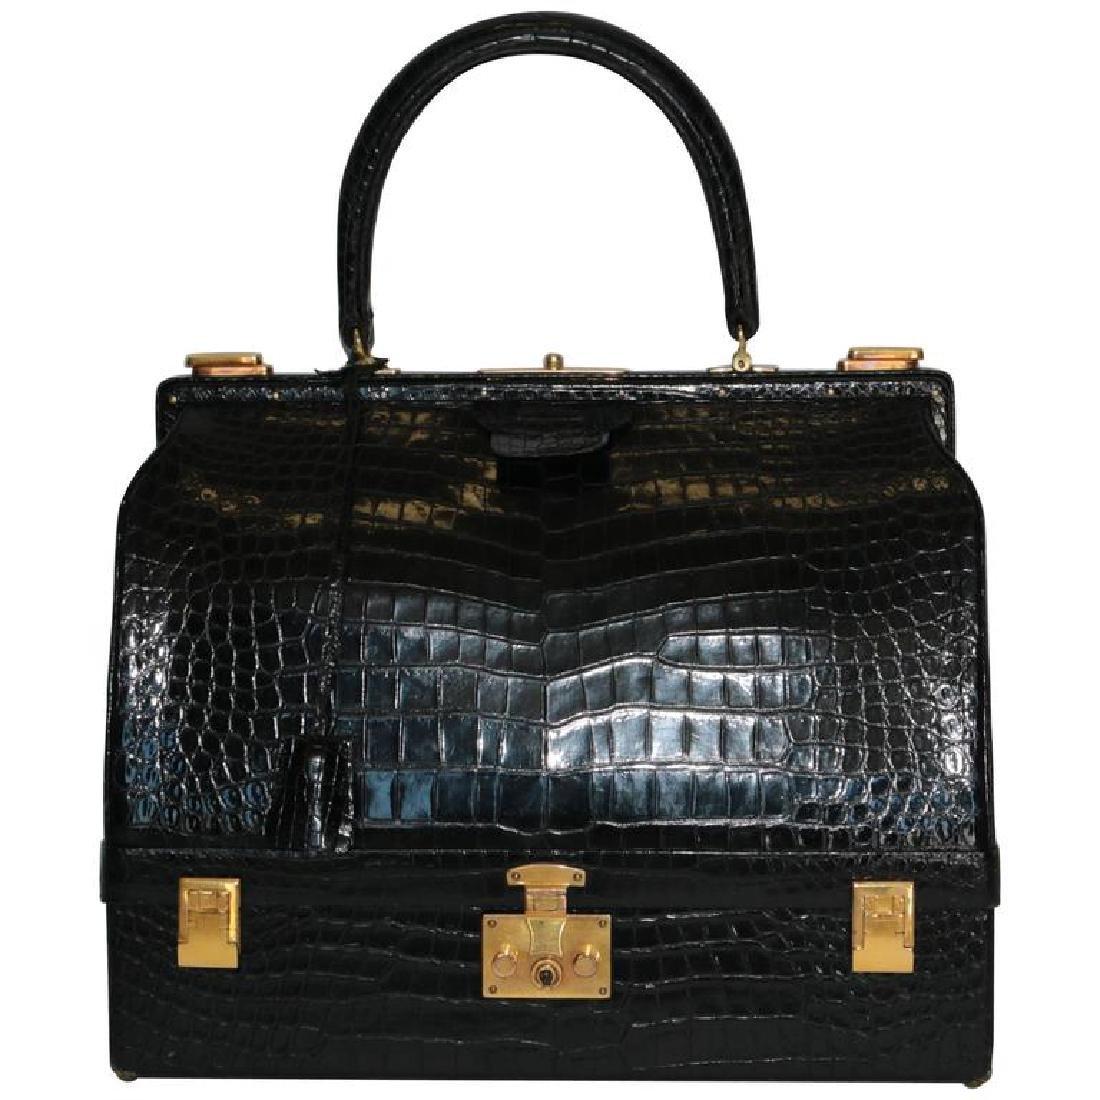 Hermes Shiny Black Crocodile Sac Mallet Bag with Gold